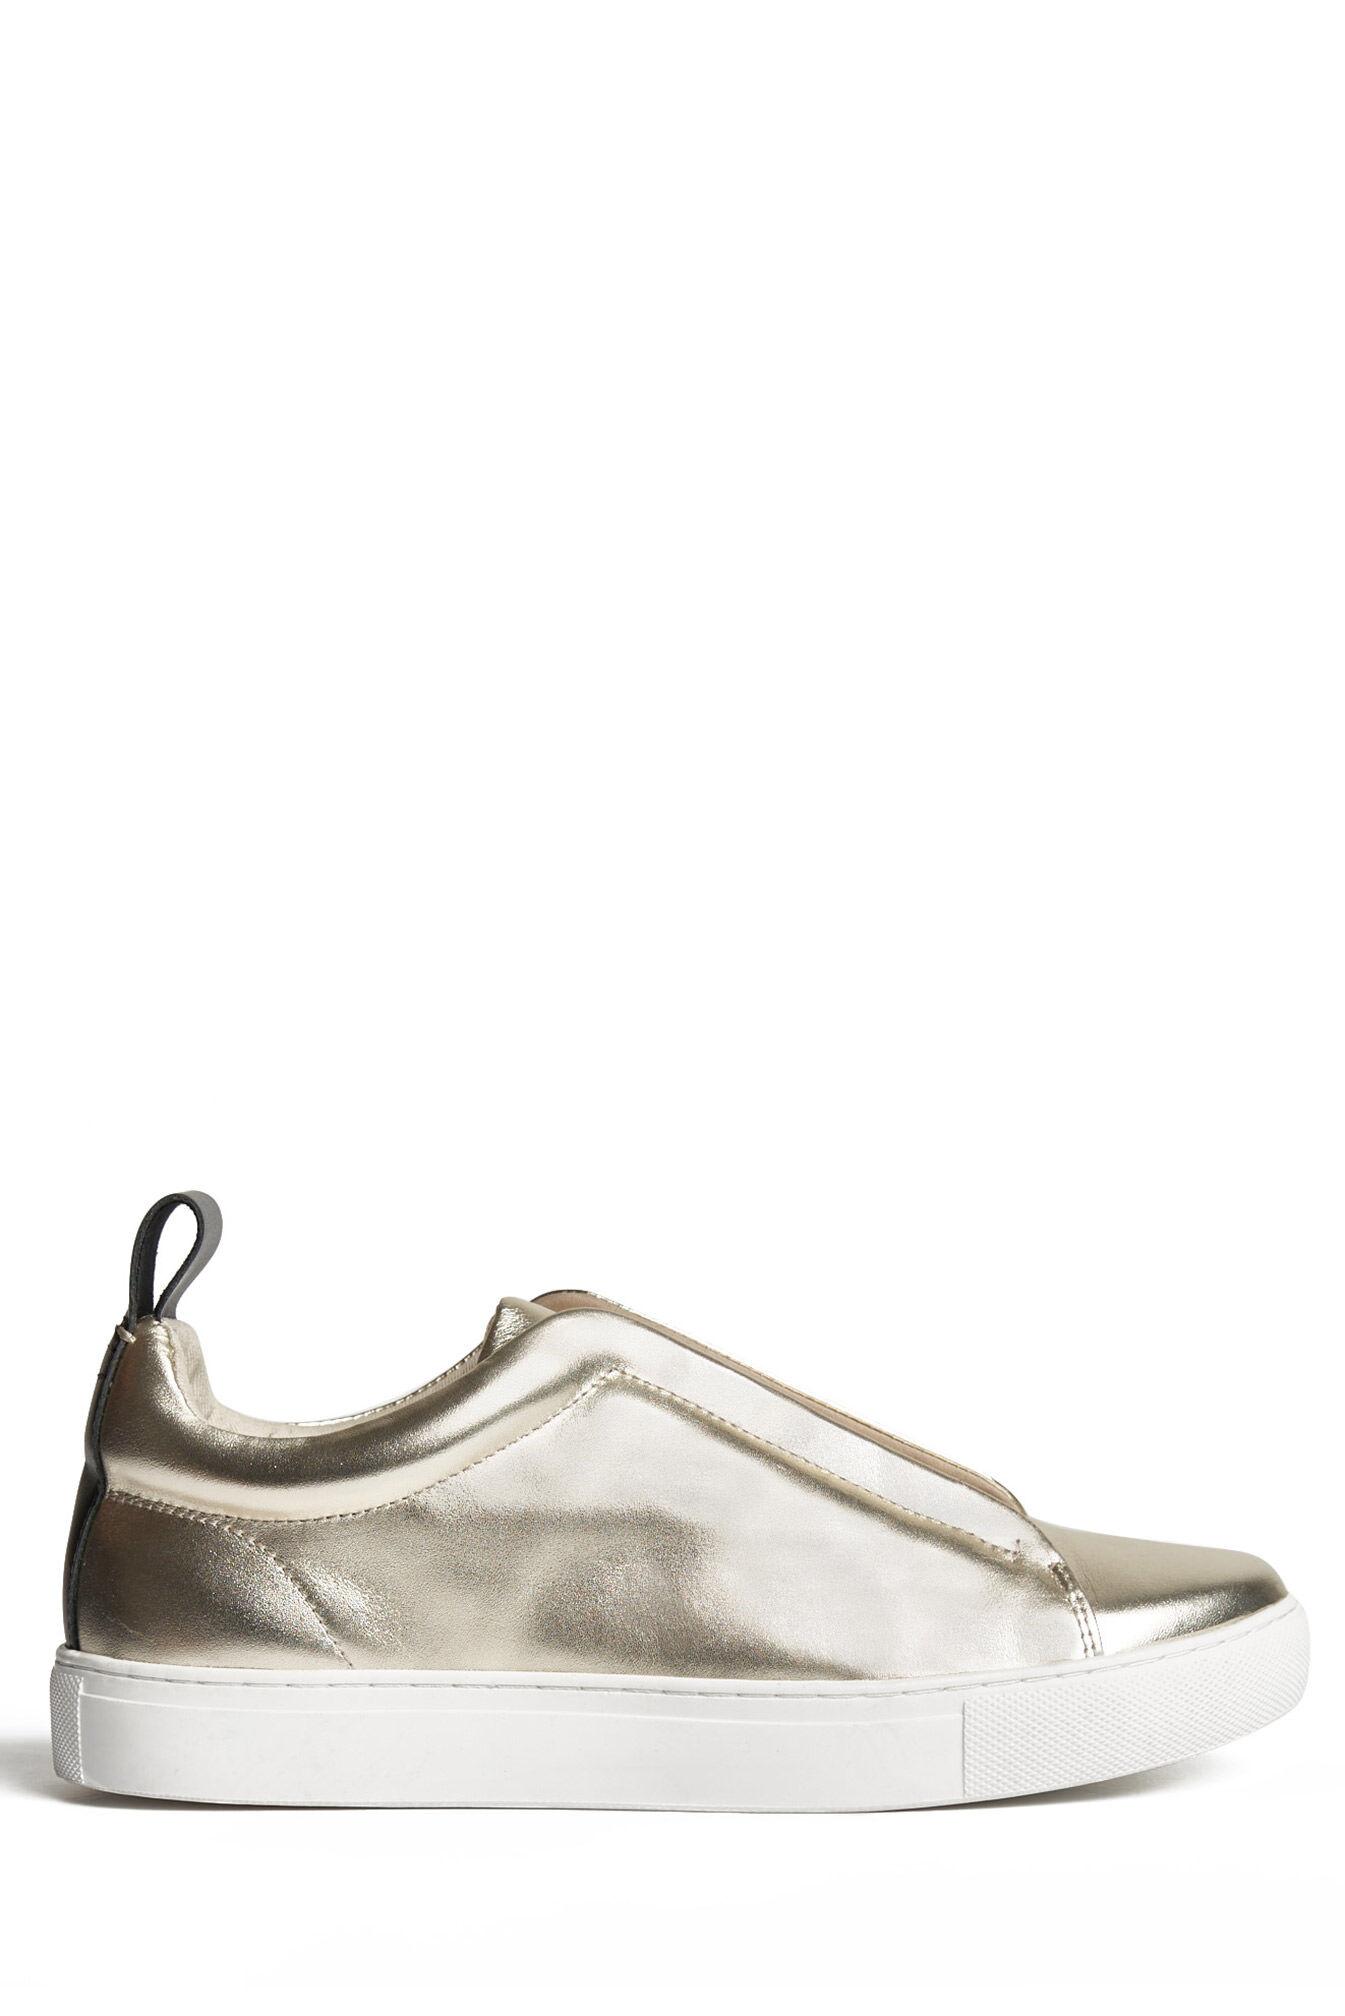 saba kelsey metallic sneakergold38